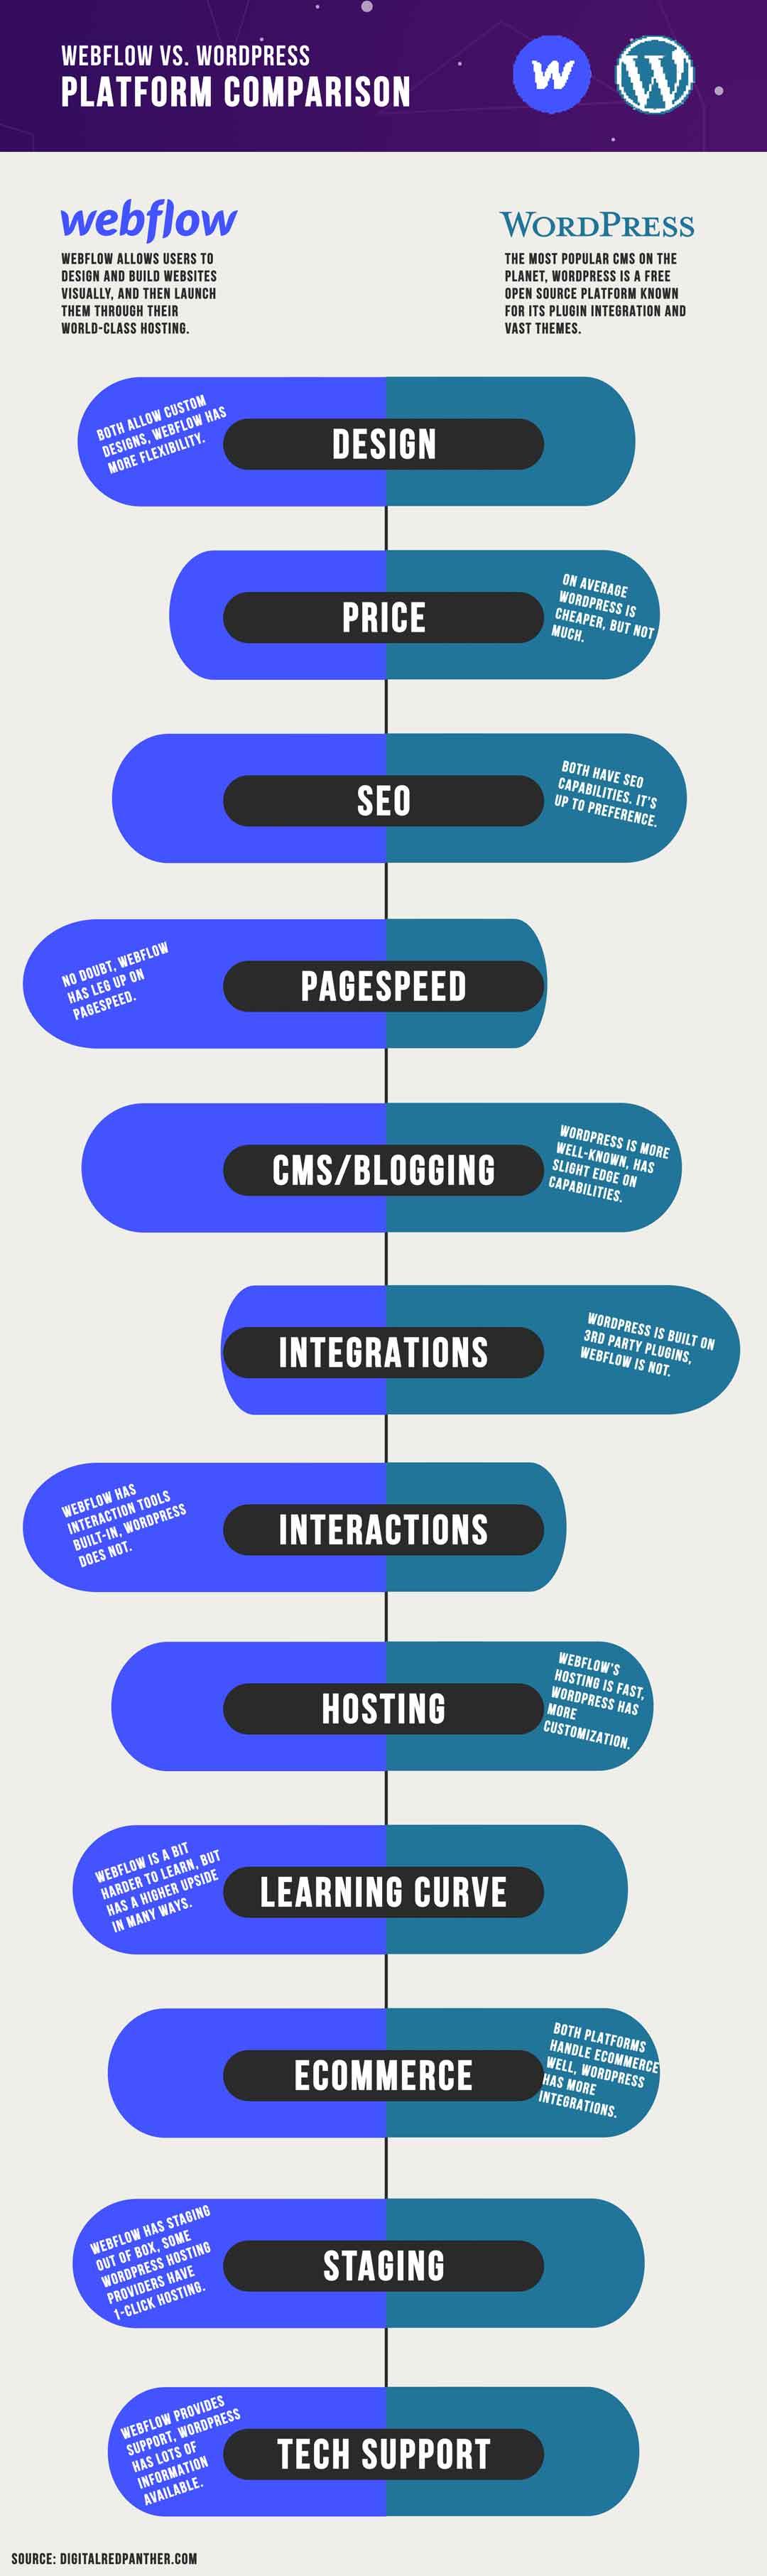 webflow and wordpress platform comparison